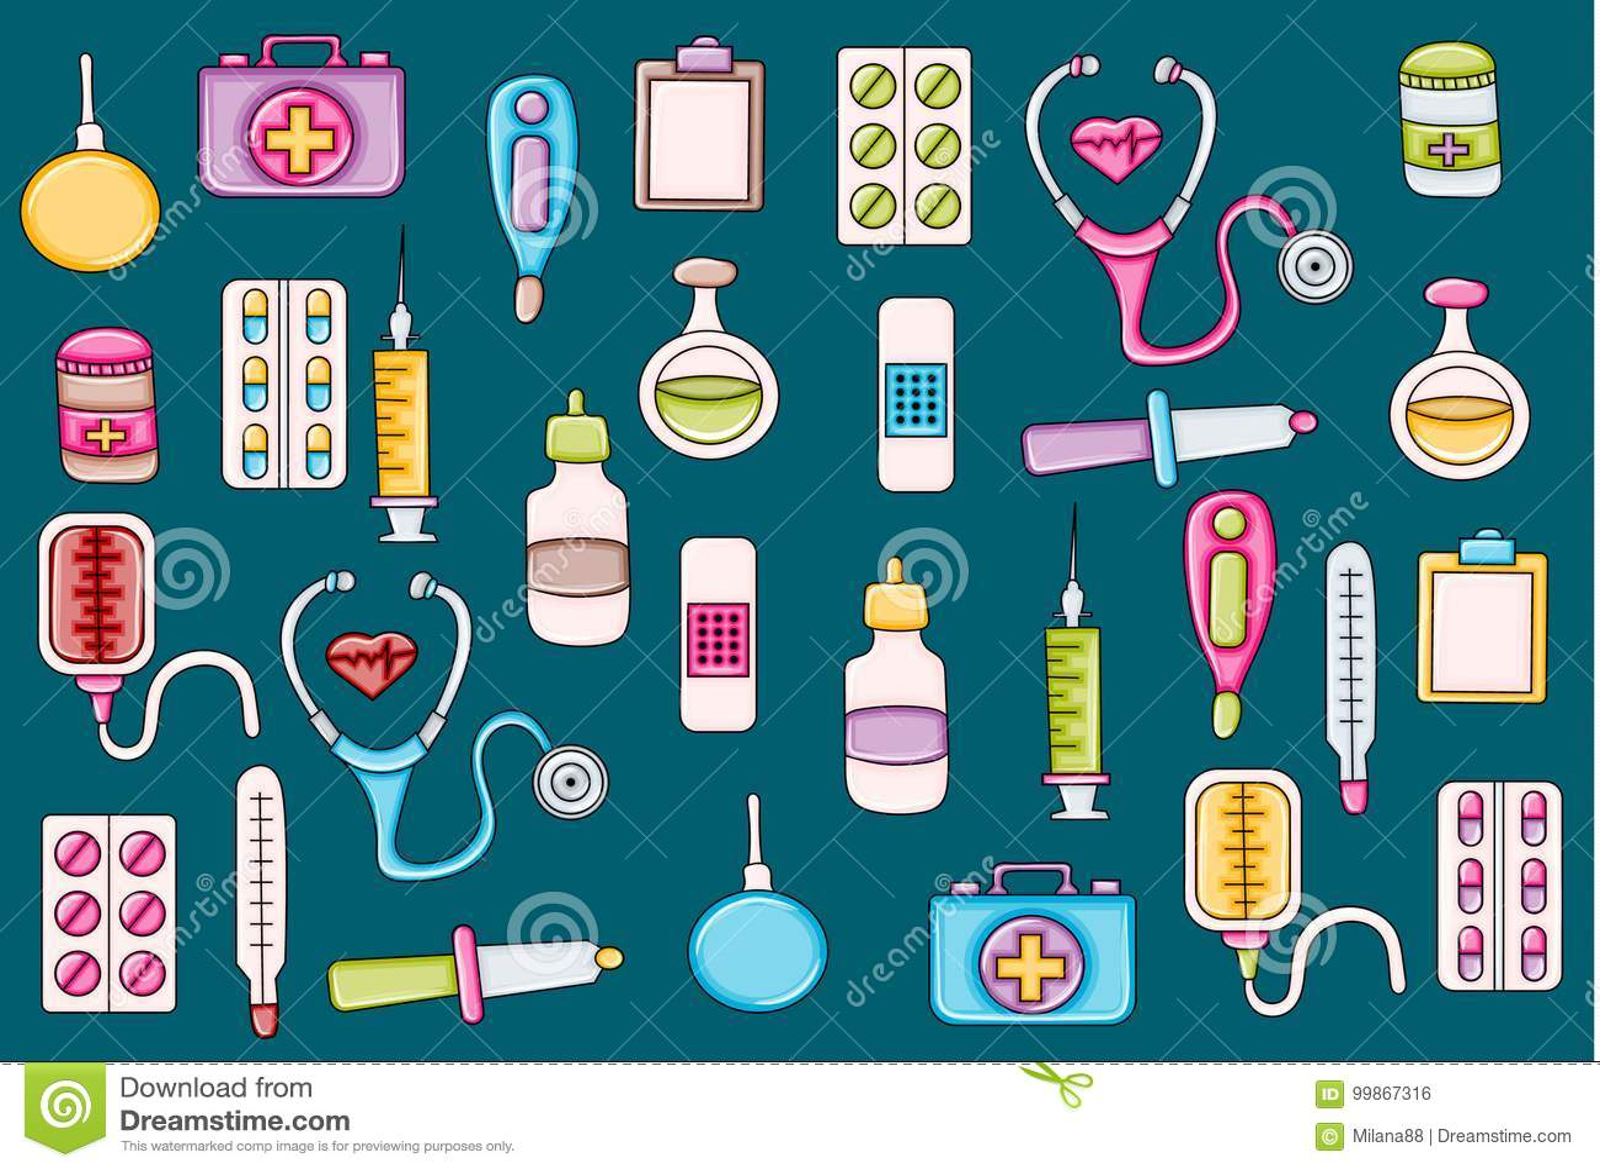 Healthcare icons concept cartoon doodle sticker design